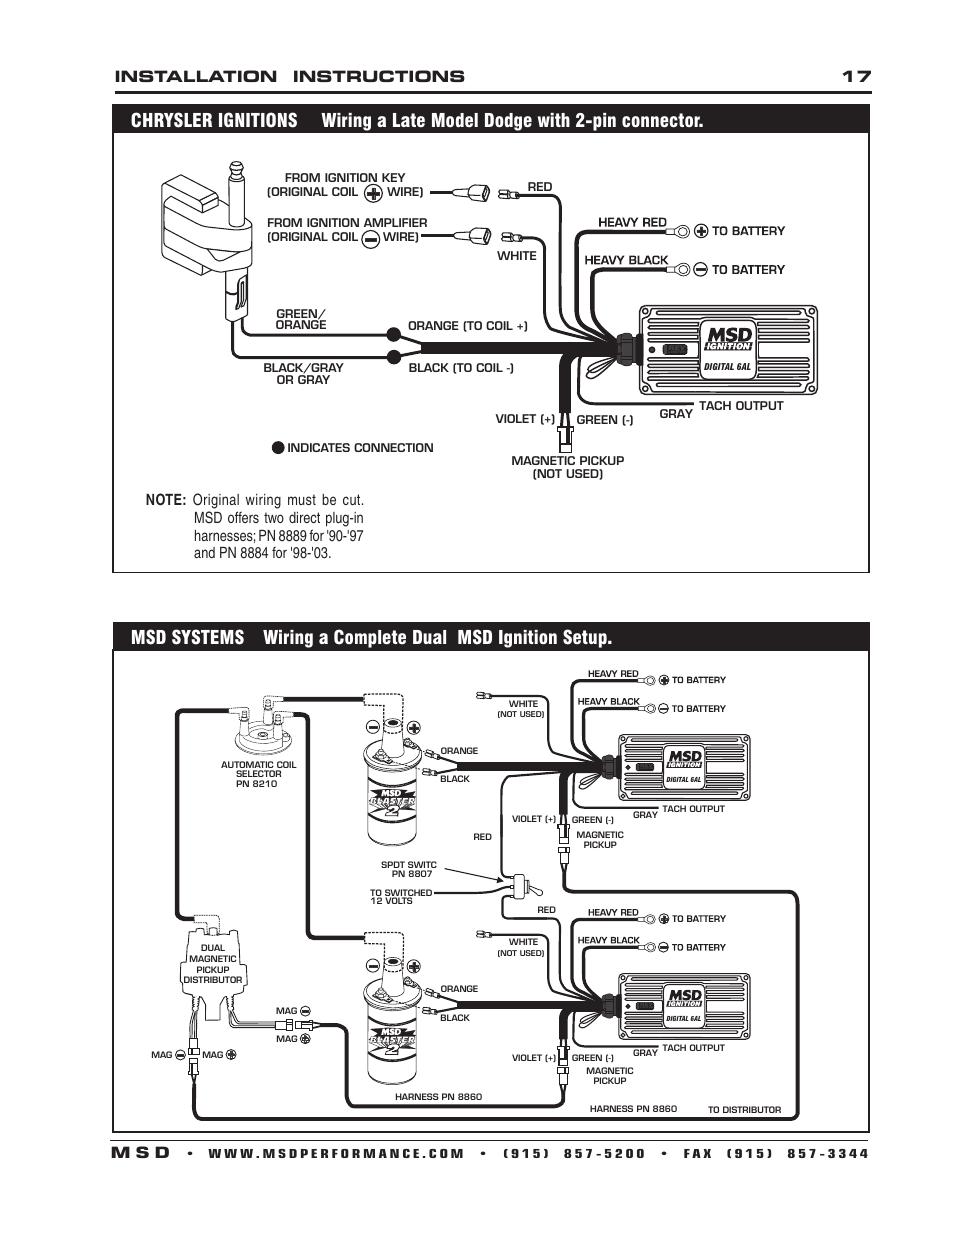 medium resolution of msd 6201 wiring diagram simple wiring diagram rh 20 berlinsky airline de 6200 msd 6a wiring msd 6201 ignition wiring diagram gm